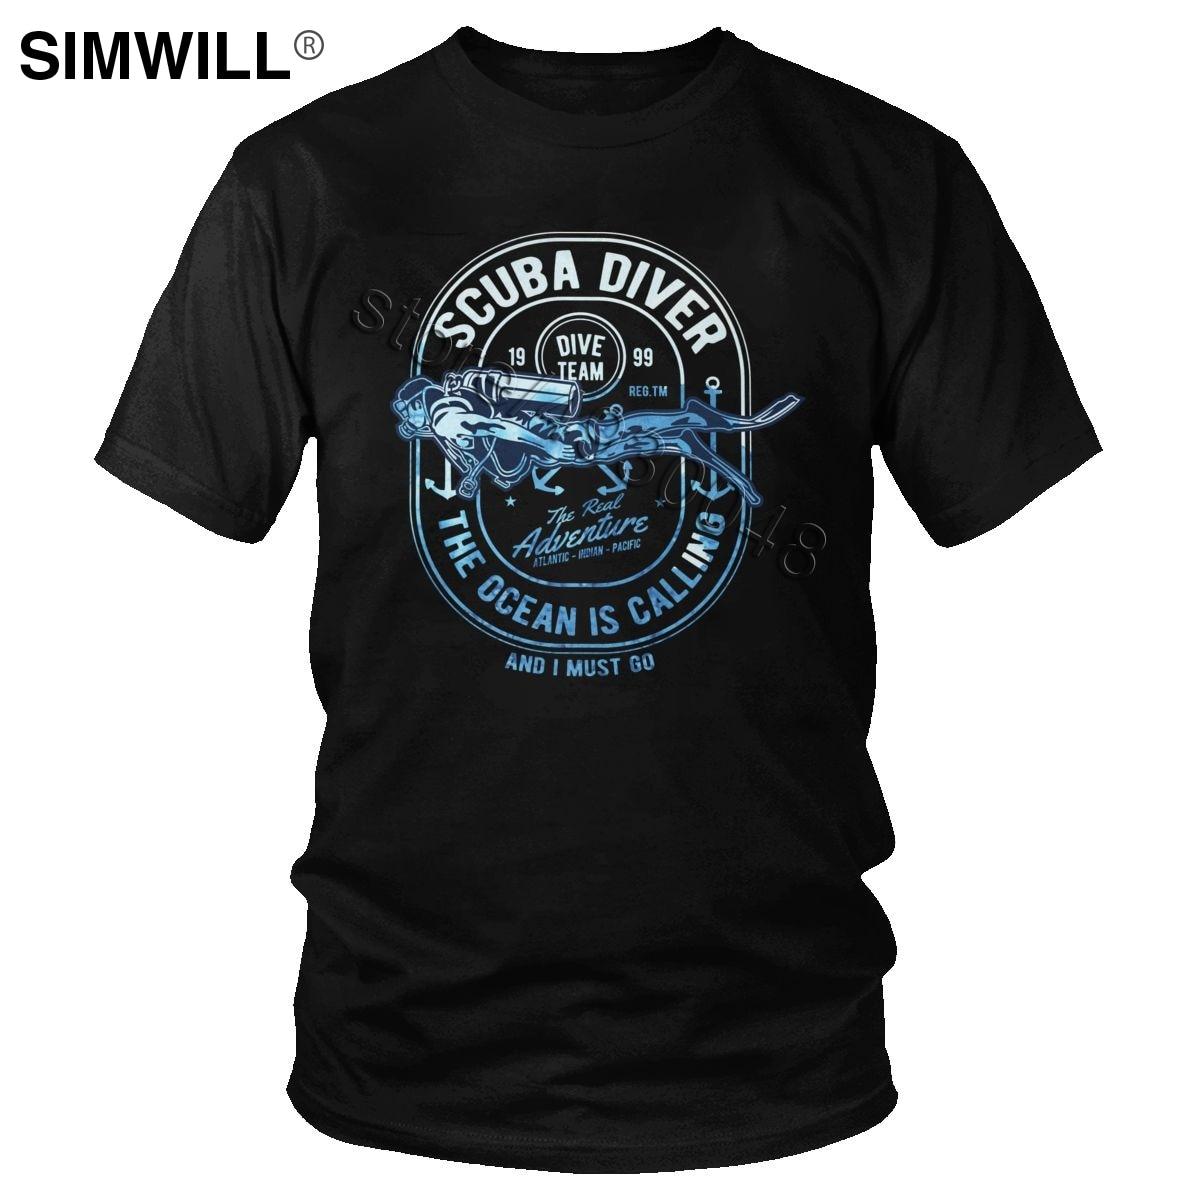 Brand Fashion Cotton T Shirt Men Scuba Diver T-Shirt Short Sleeves Streetwear Summer Leisure Tee Tops Diving Lover Gift Clothing